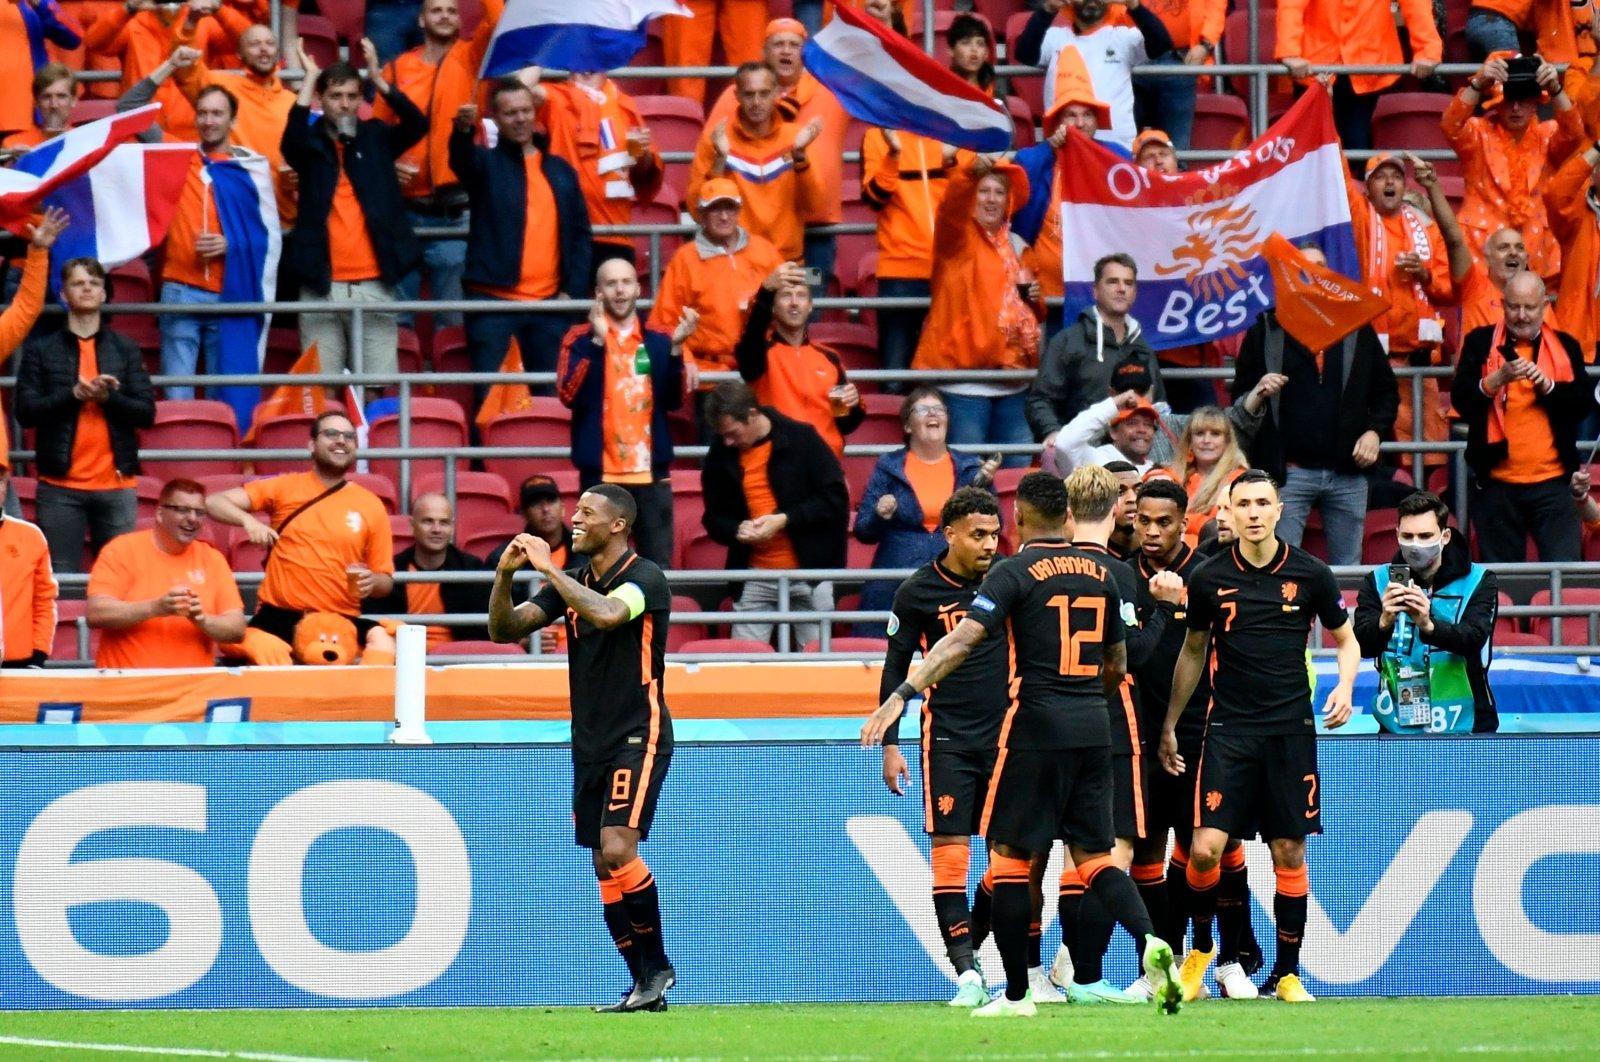 Netherlands captain Georginio Wijnaldum celebrates scoring his team's second goal with teammates during a UEFA Euro 2020 Group C match against North Macedonia at Johan Cruijff Arena, Amsterdam, Netherlands, June 21, 2021. (Reuters Photo/Pool/Piroschka Van De Wouw)